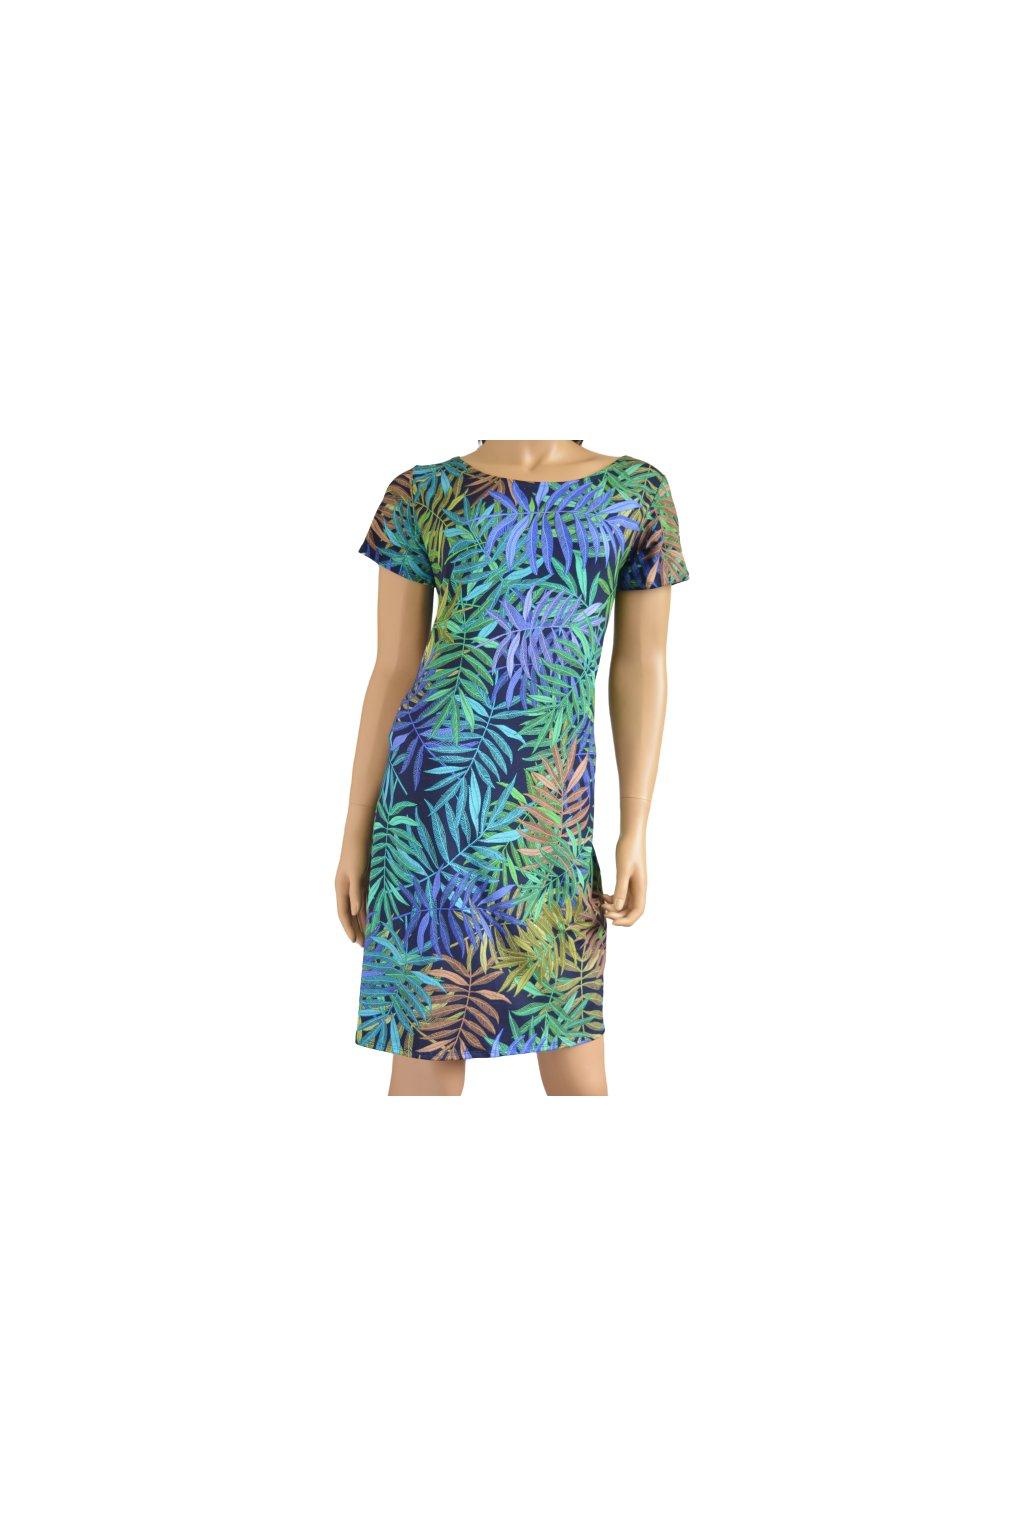 Šaty Leona -  palmy